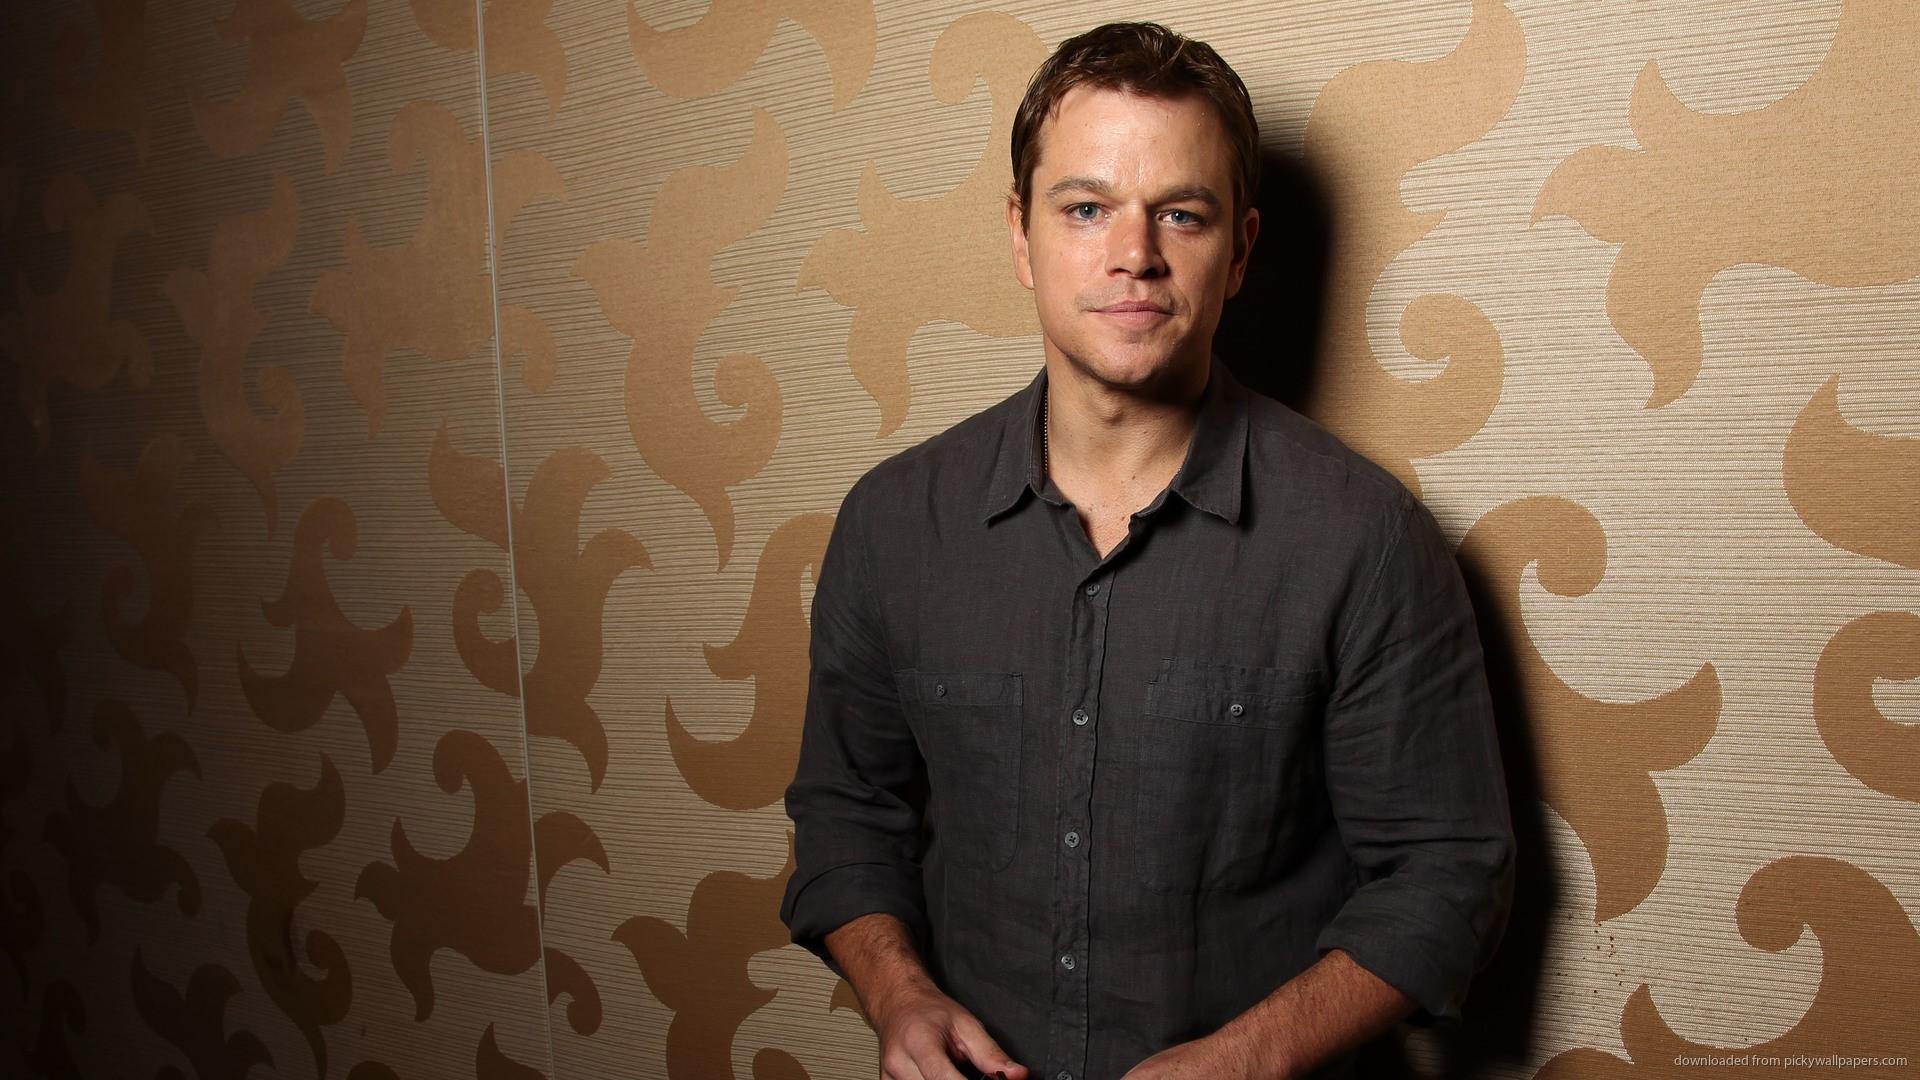 Matt Damon Pictures